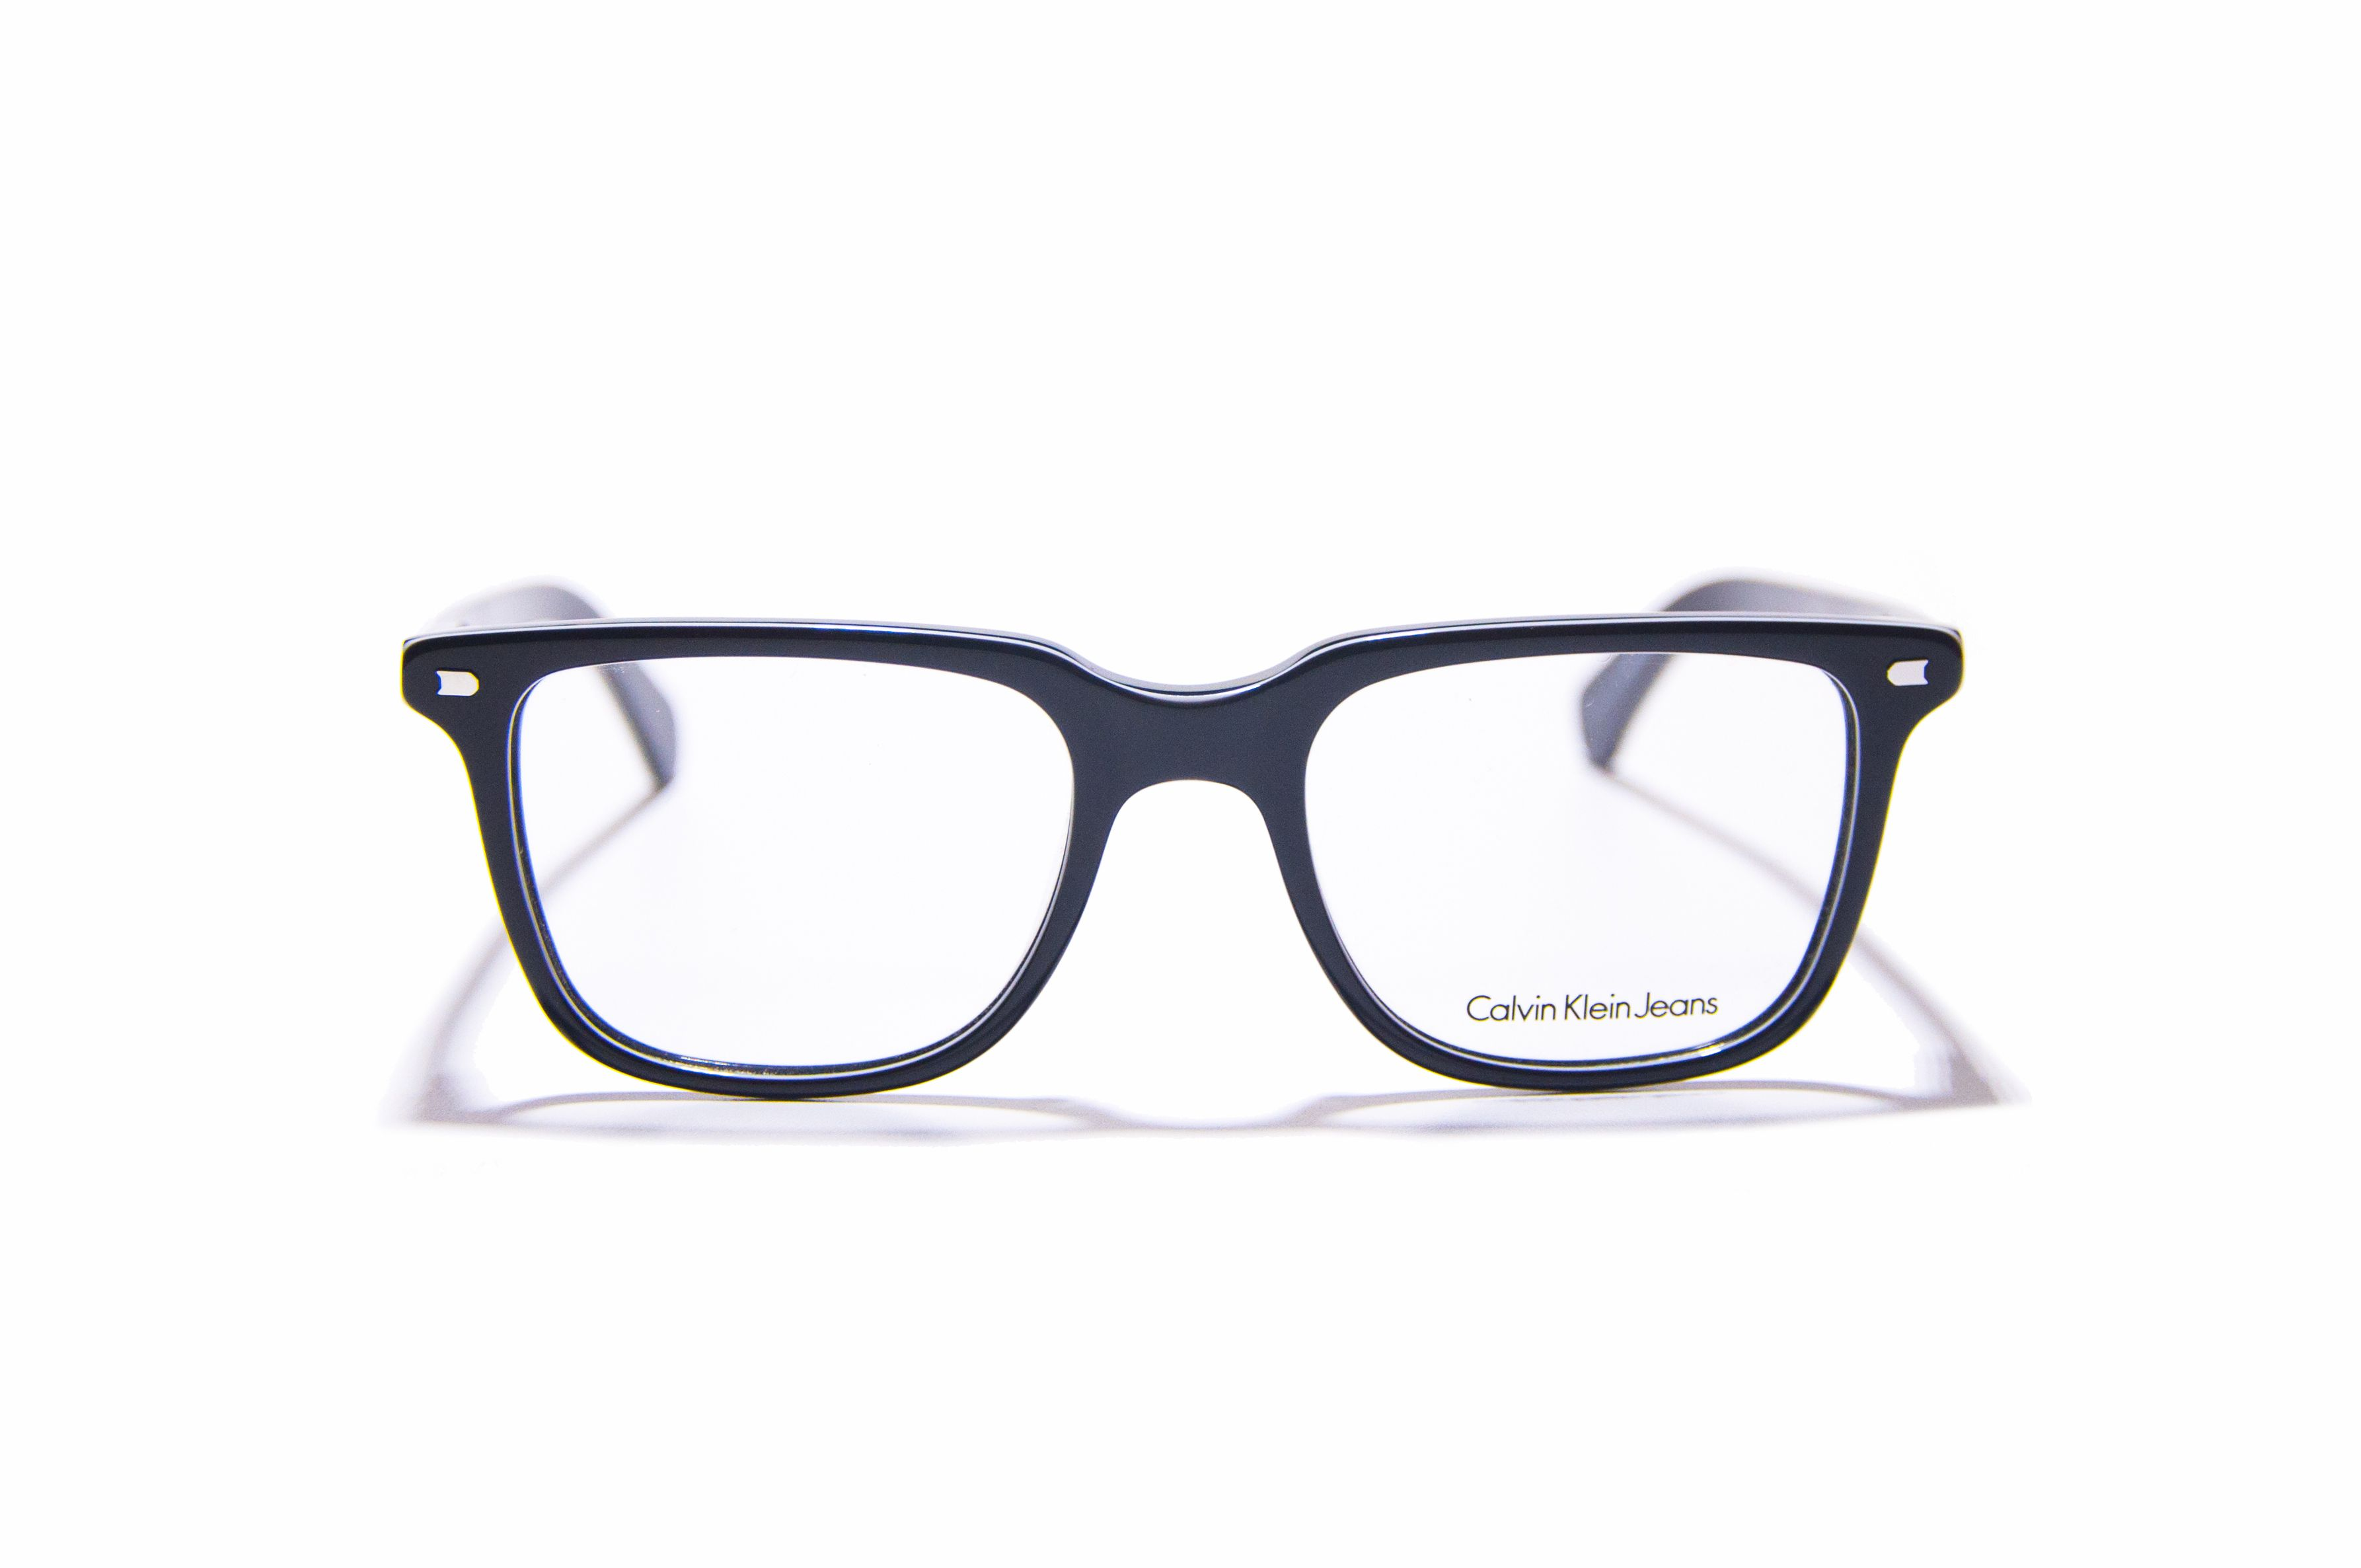 Collection CK Jeans Optique. Réf: CKJ931-018 #AlainAfflelou #StyleAfflelou